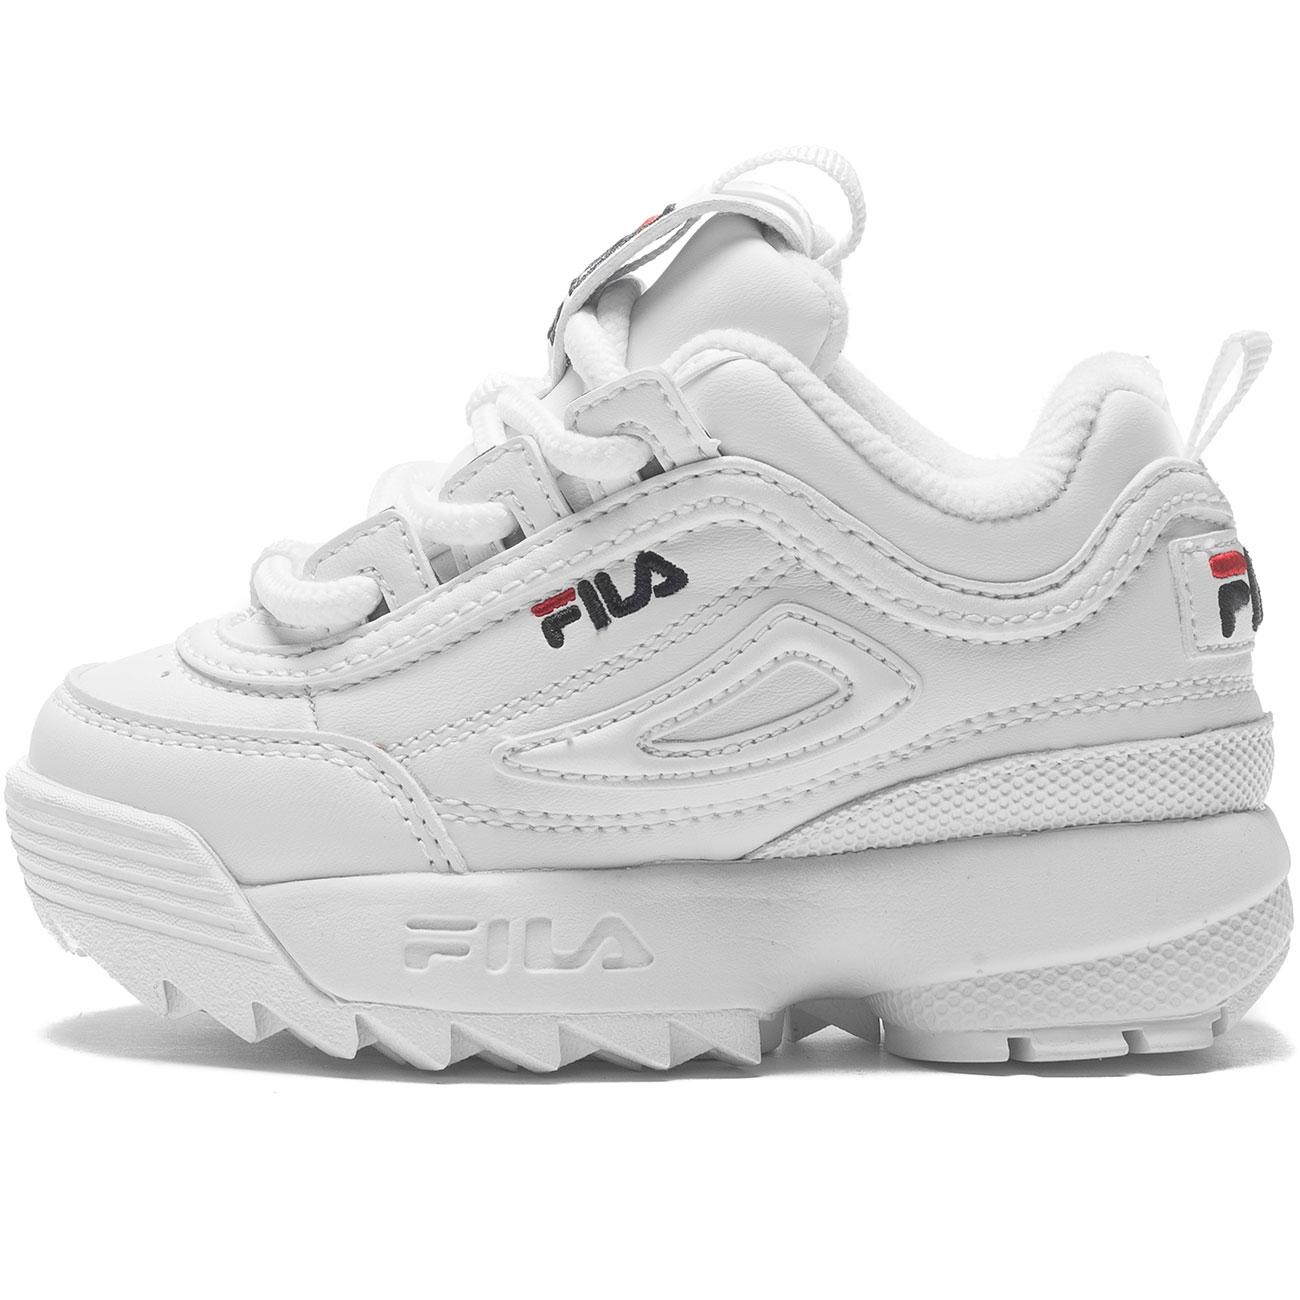 Fila Disruptor Sneakers White